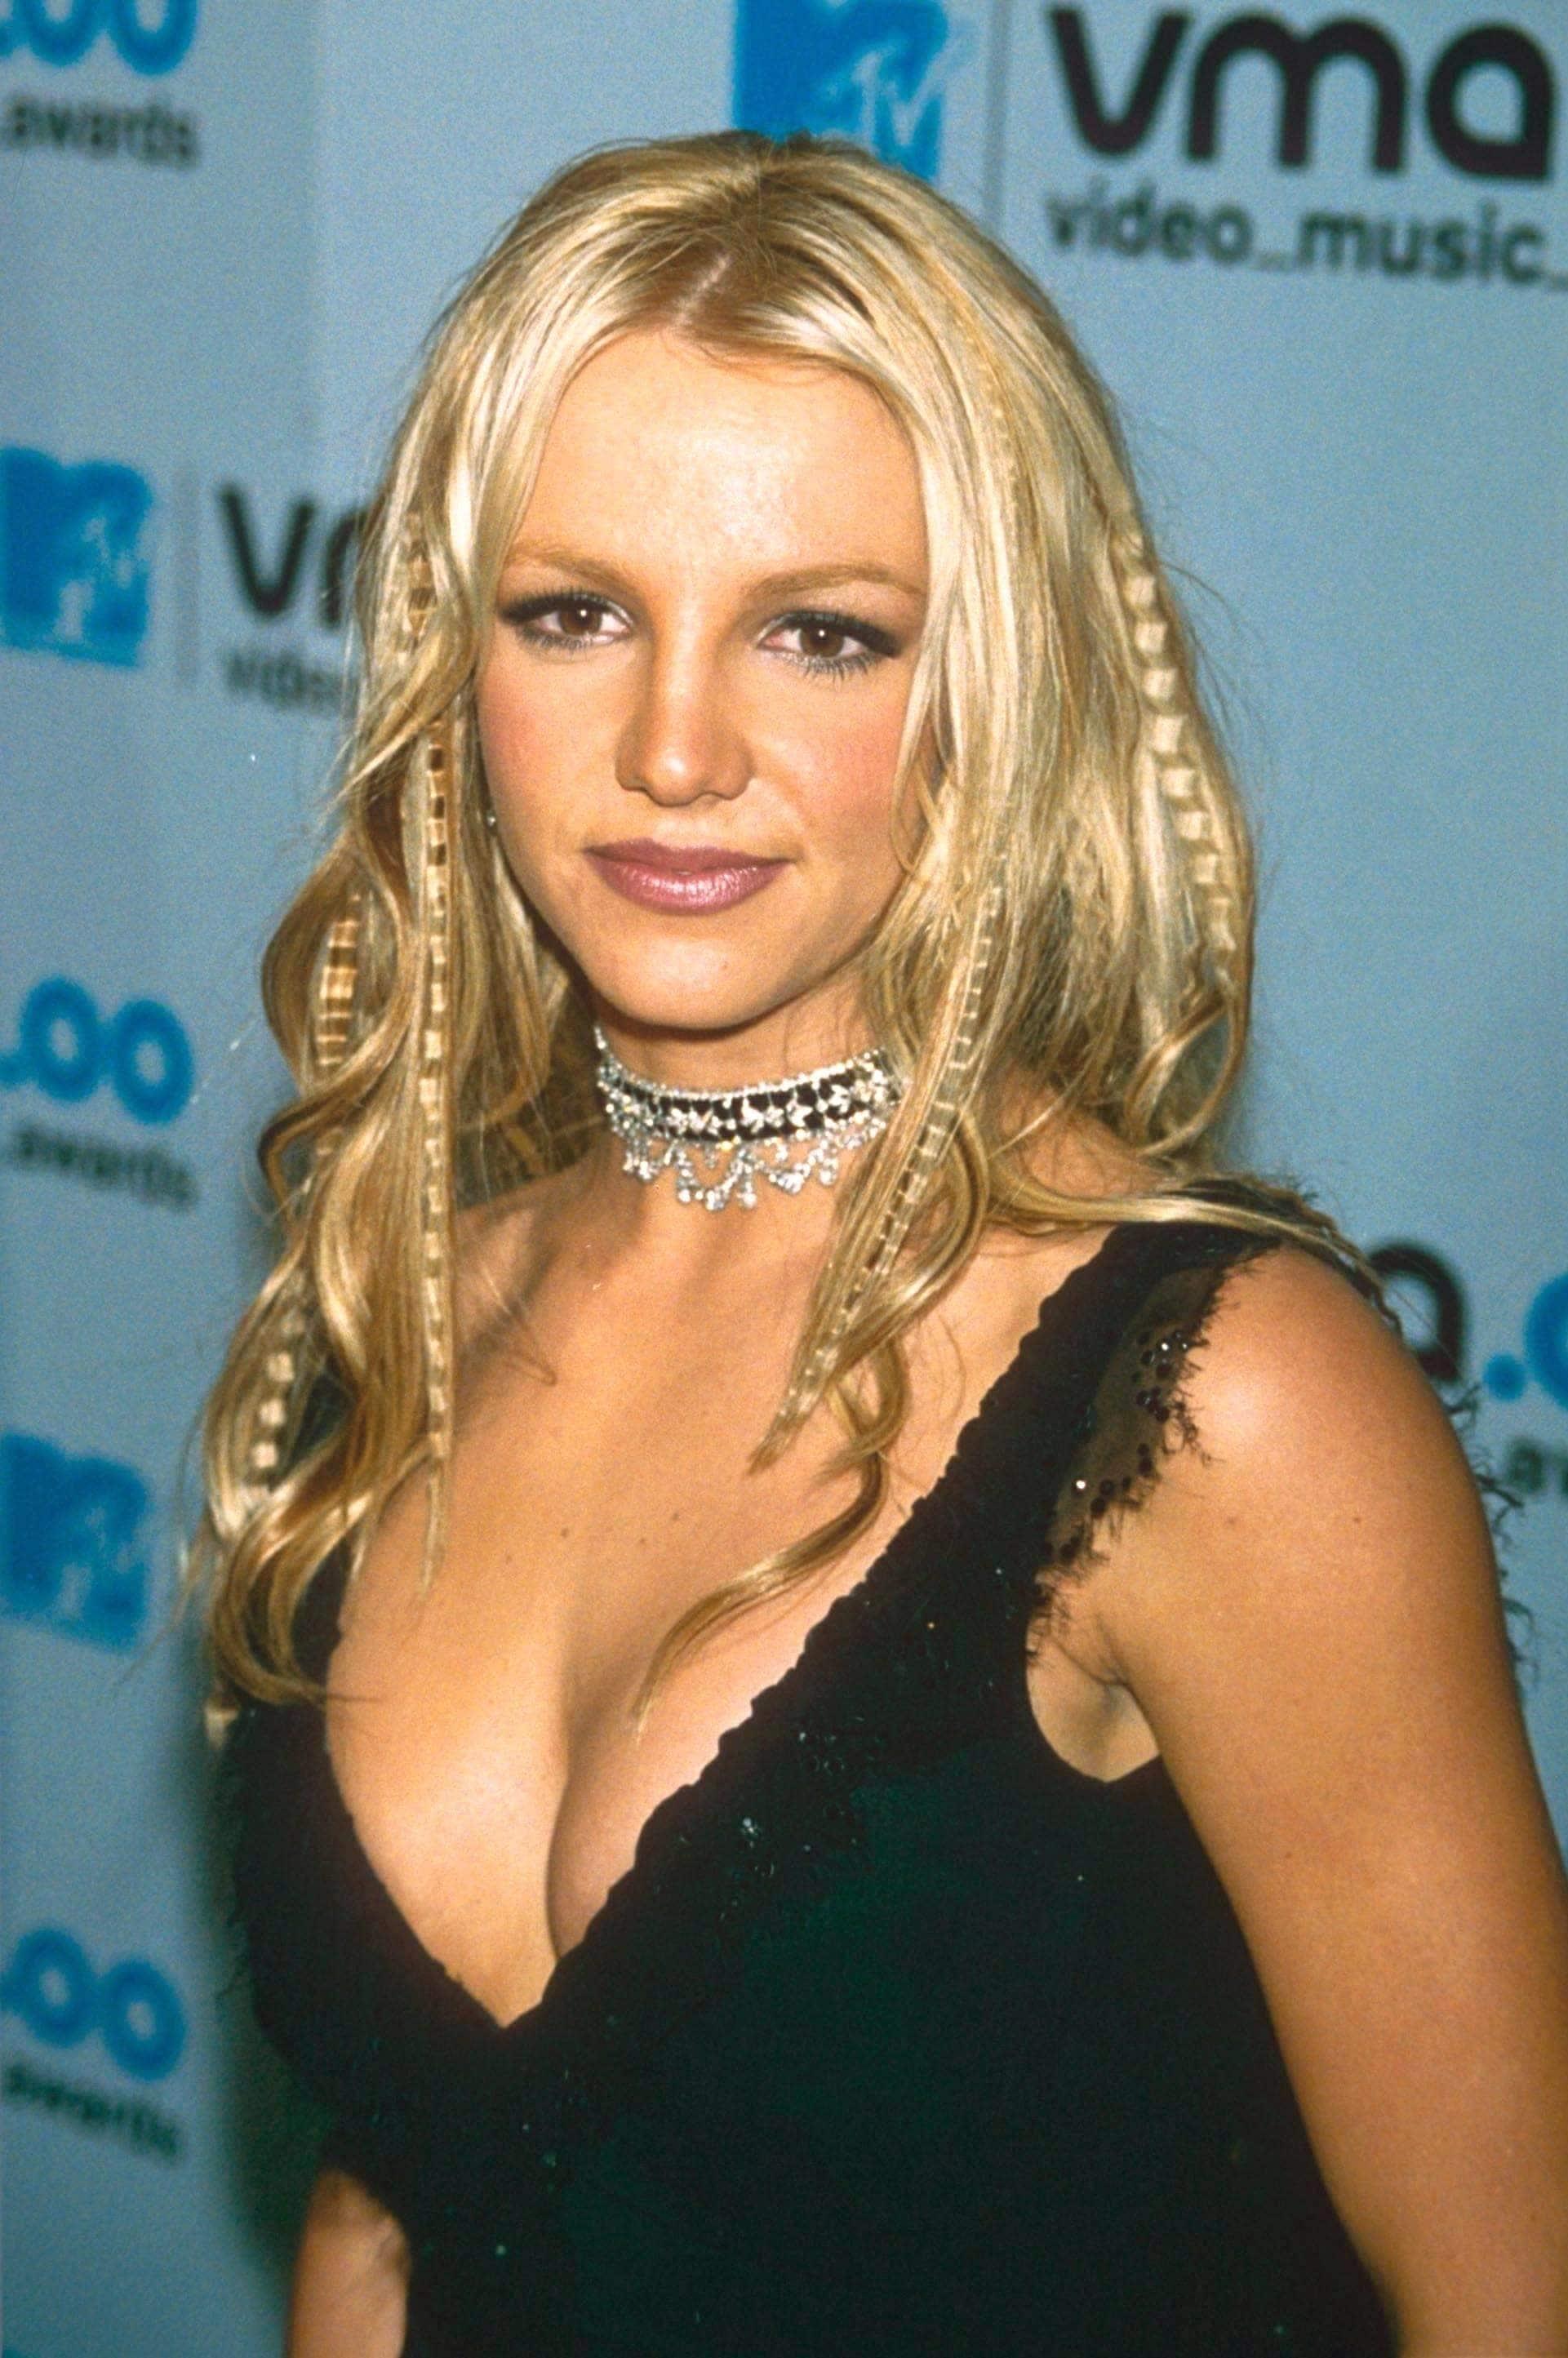 Crimped hair: Britney Spears with blonde medium length wavy hair wearing a black dress at MTV VMAs.